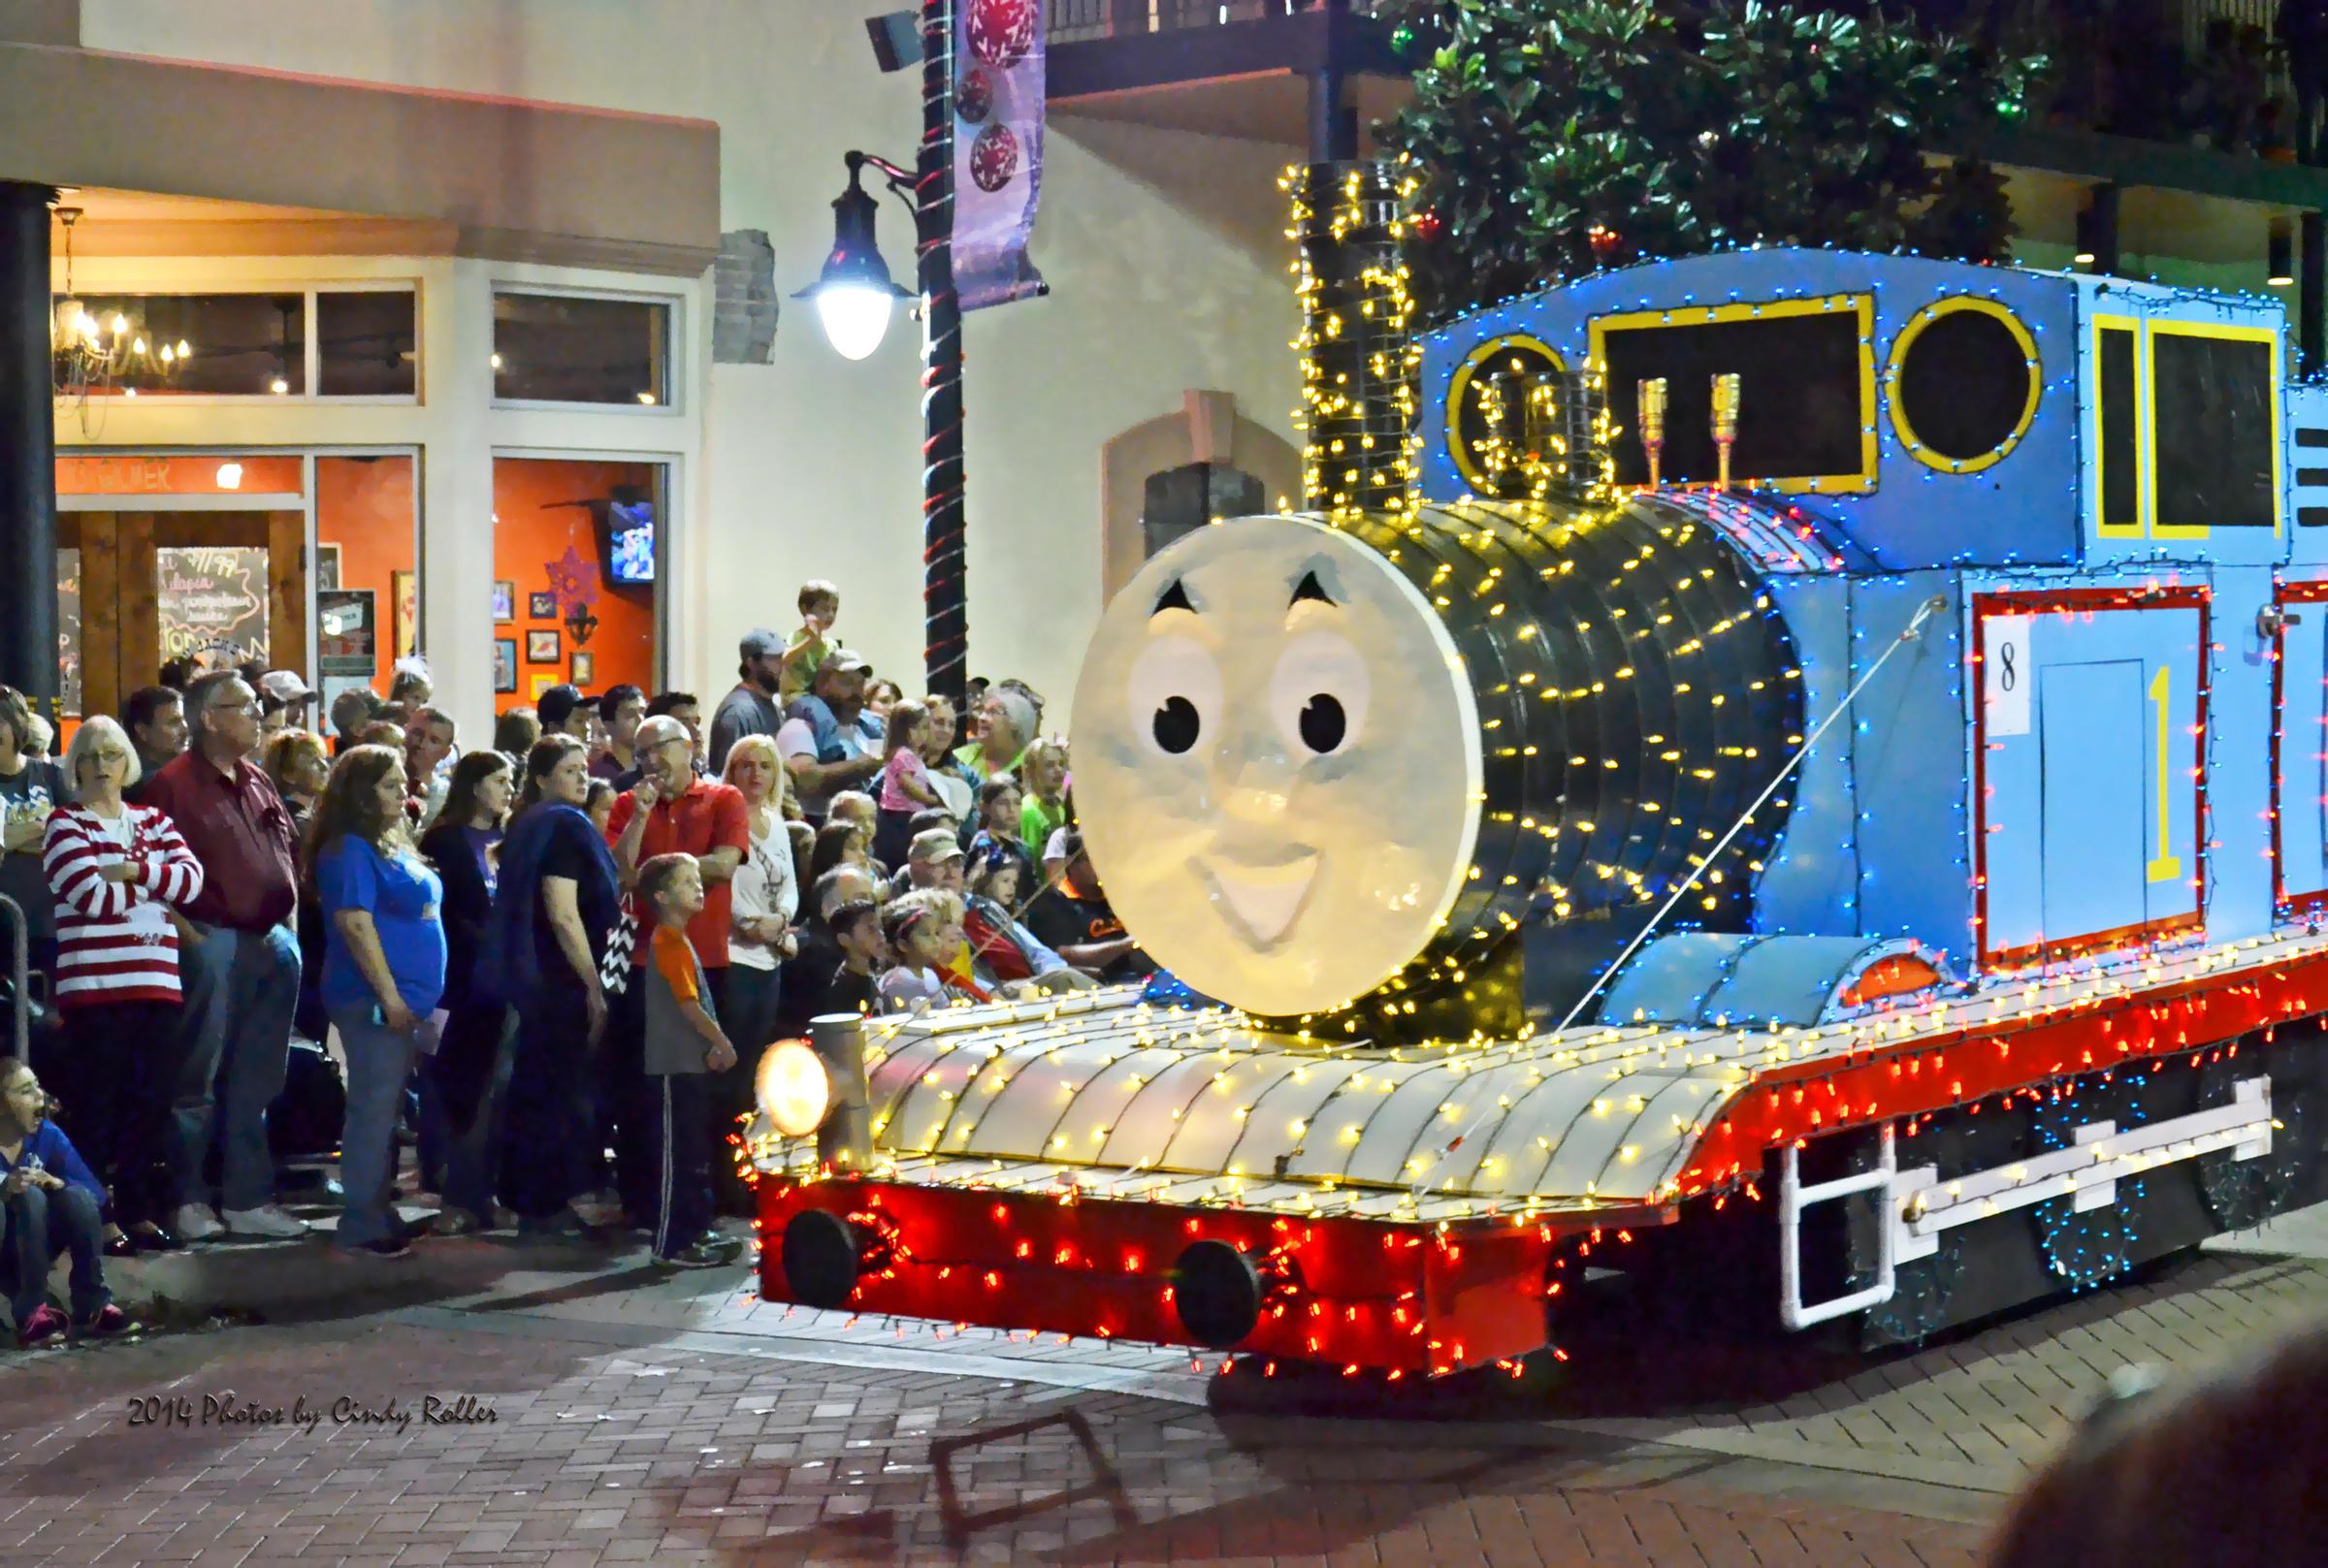 Lions Club 2014 Christmas Parade of Lights Highlights | 88.9 KETR